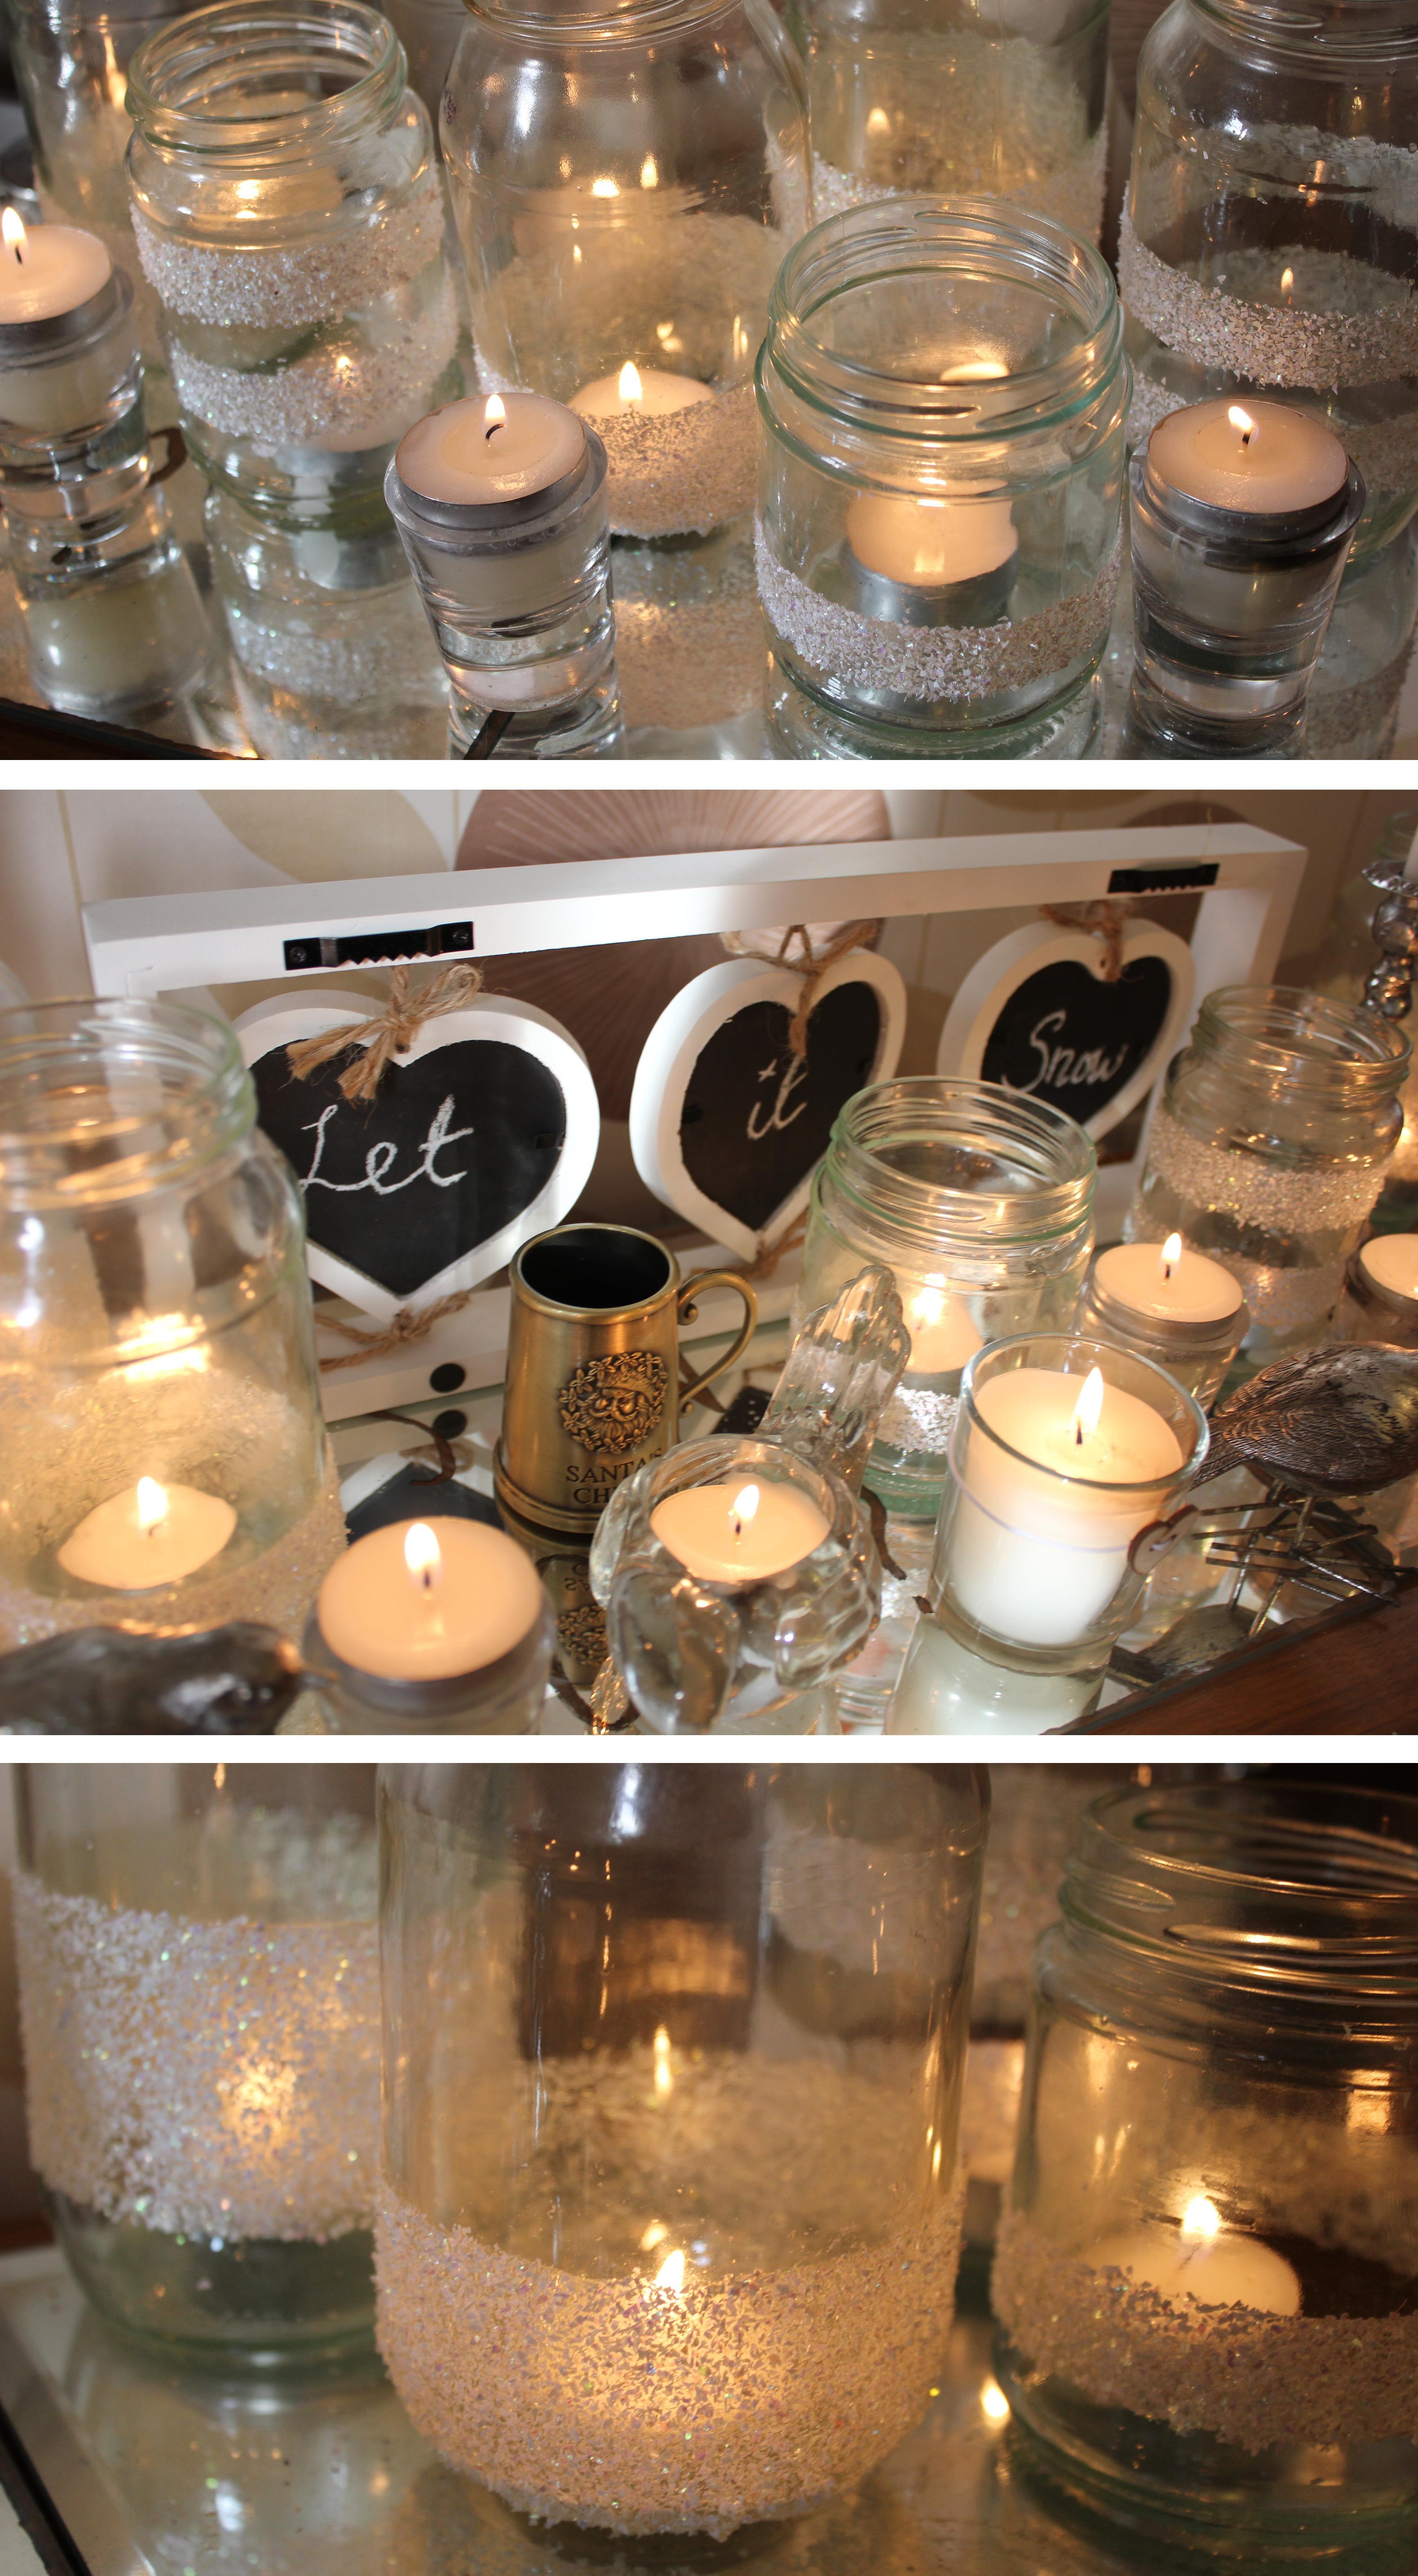 Quick Christmas tea-light holder DIY | Cassiefairy - My ...